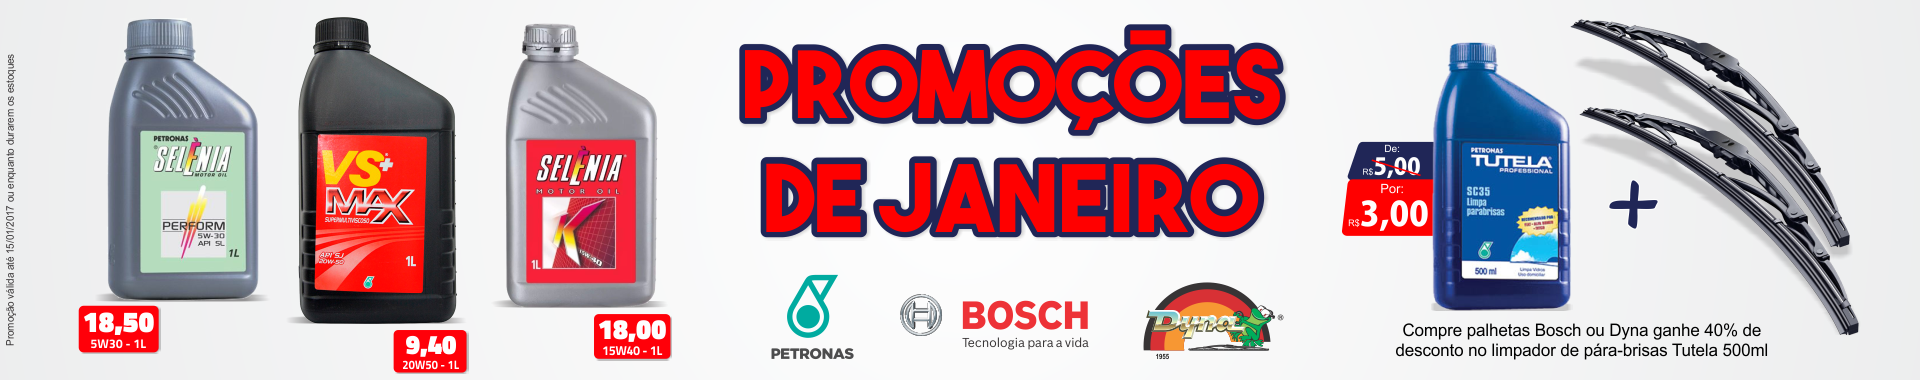 BANNER-PROMOCOES-JANEIRO